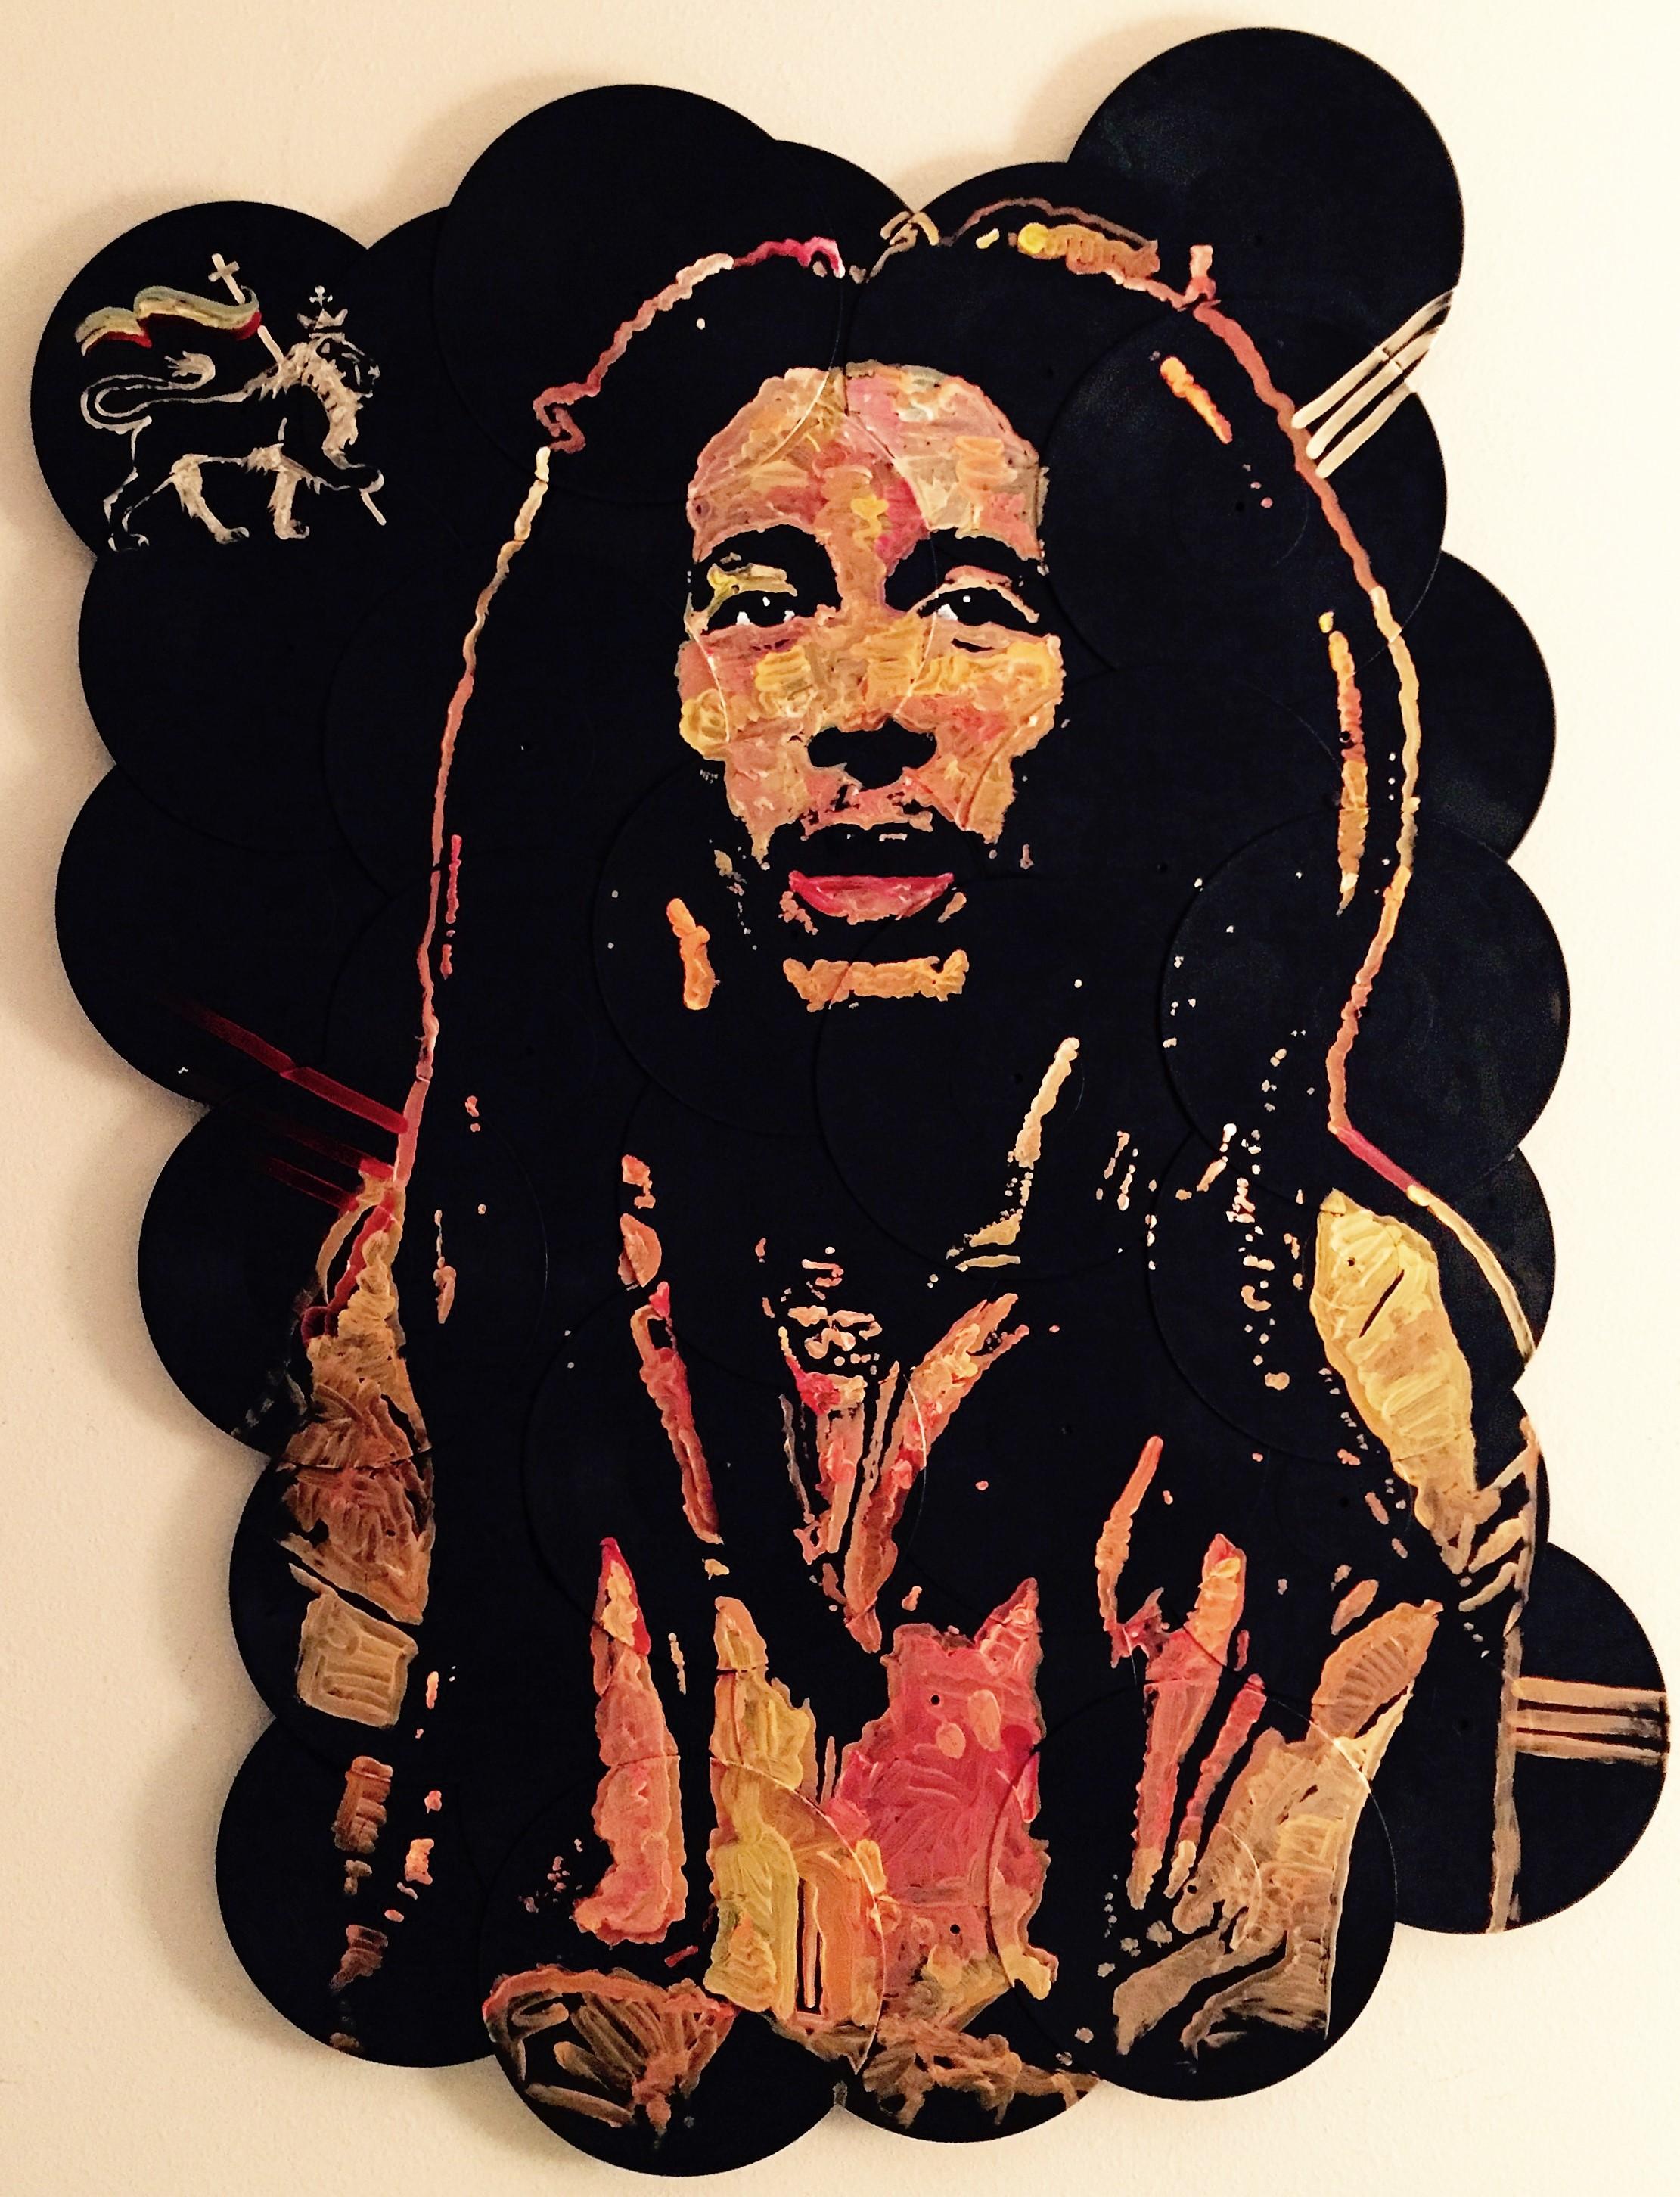 """Iron Lion Zion"", Bob Marley, 48x60, Acrylic on Vinyl Records"